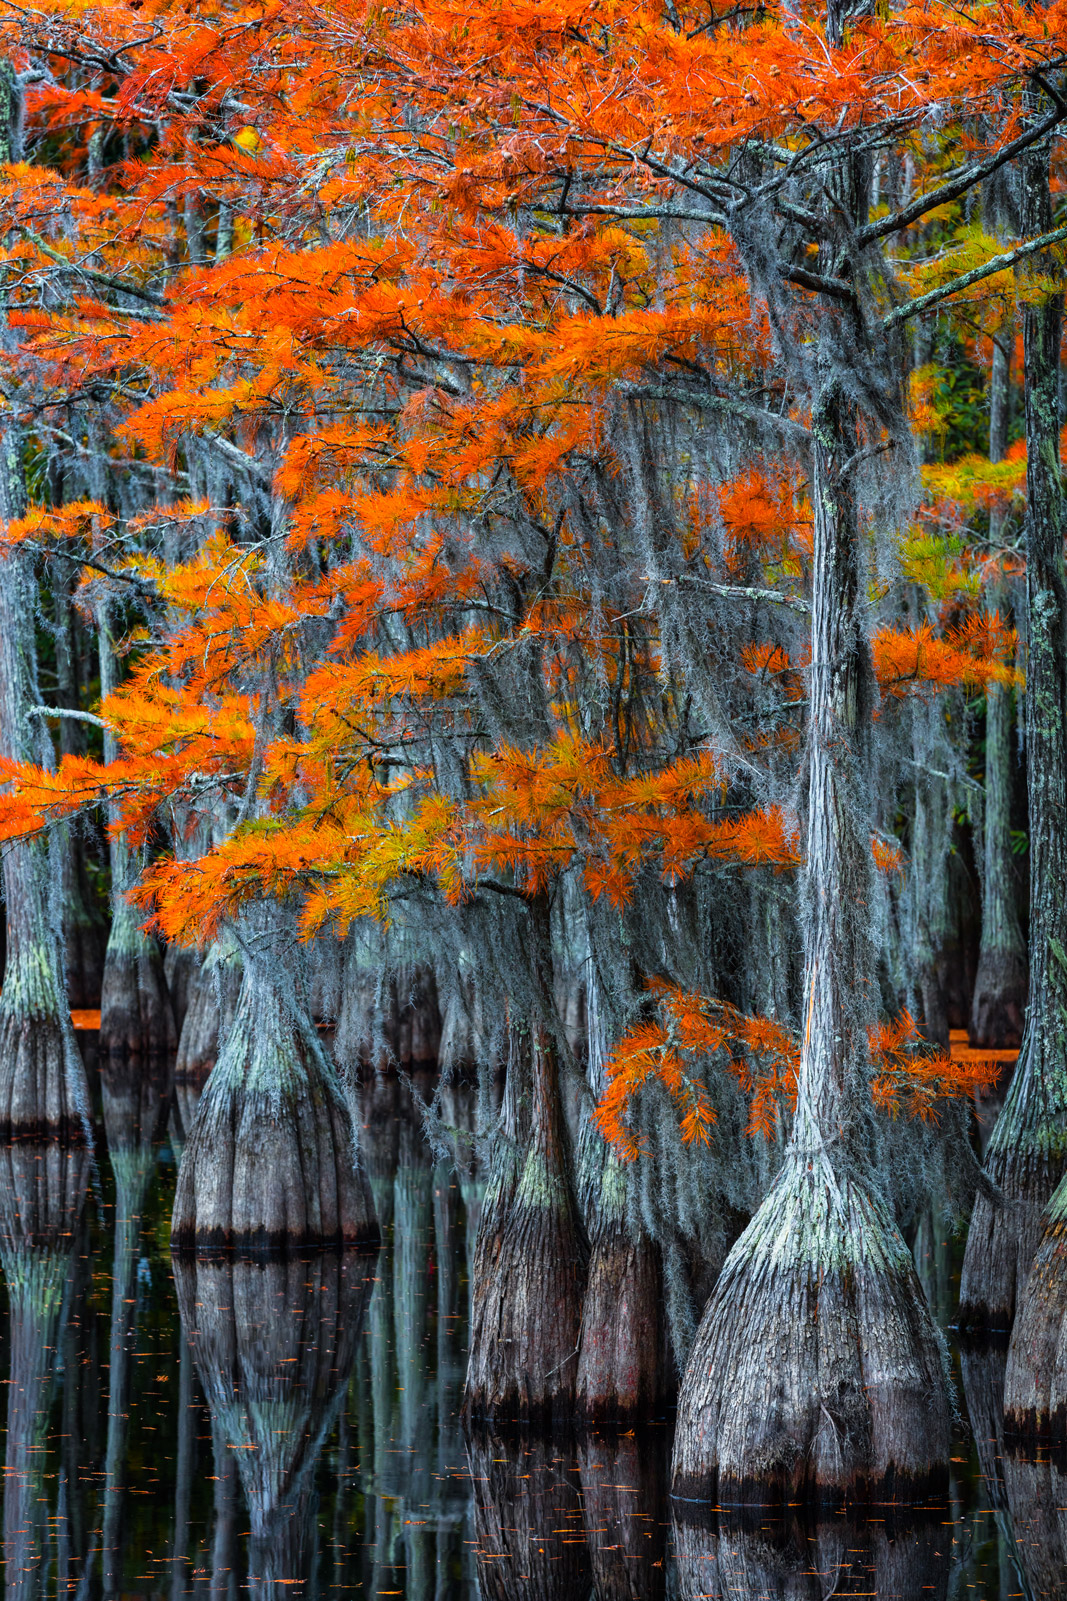 Georgia, Swamp, George Smith, fall color, cypress trees, photo